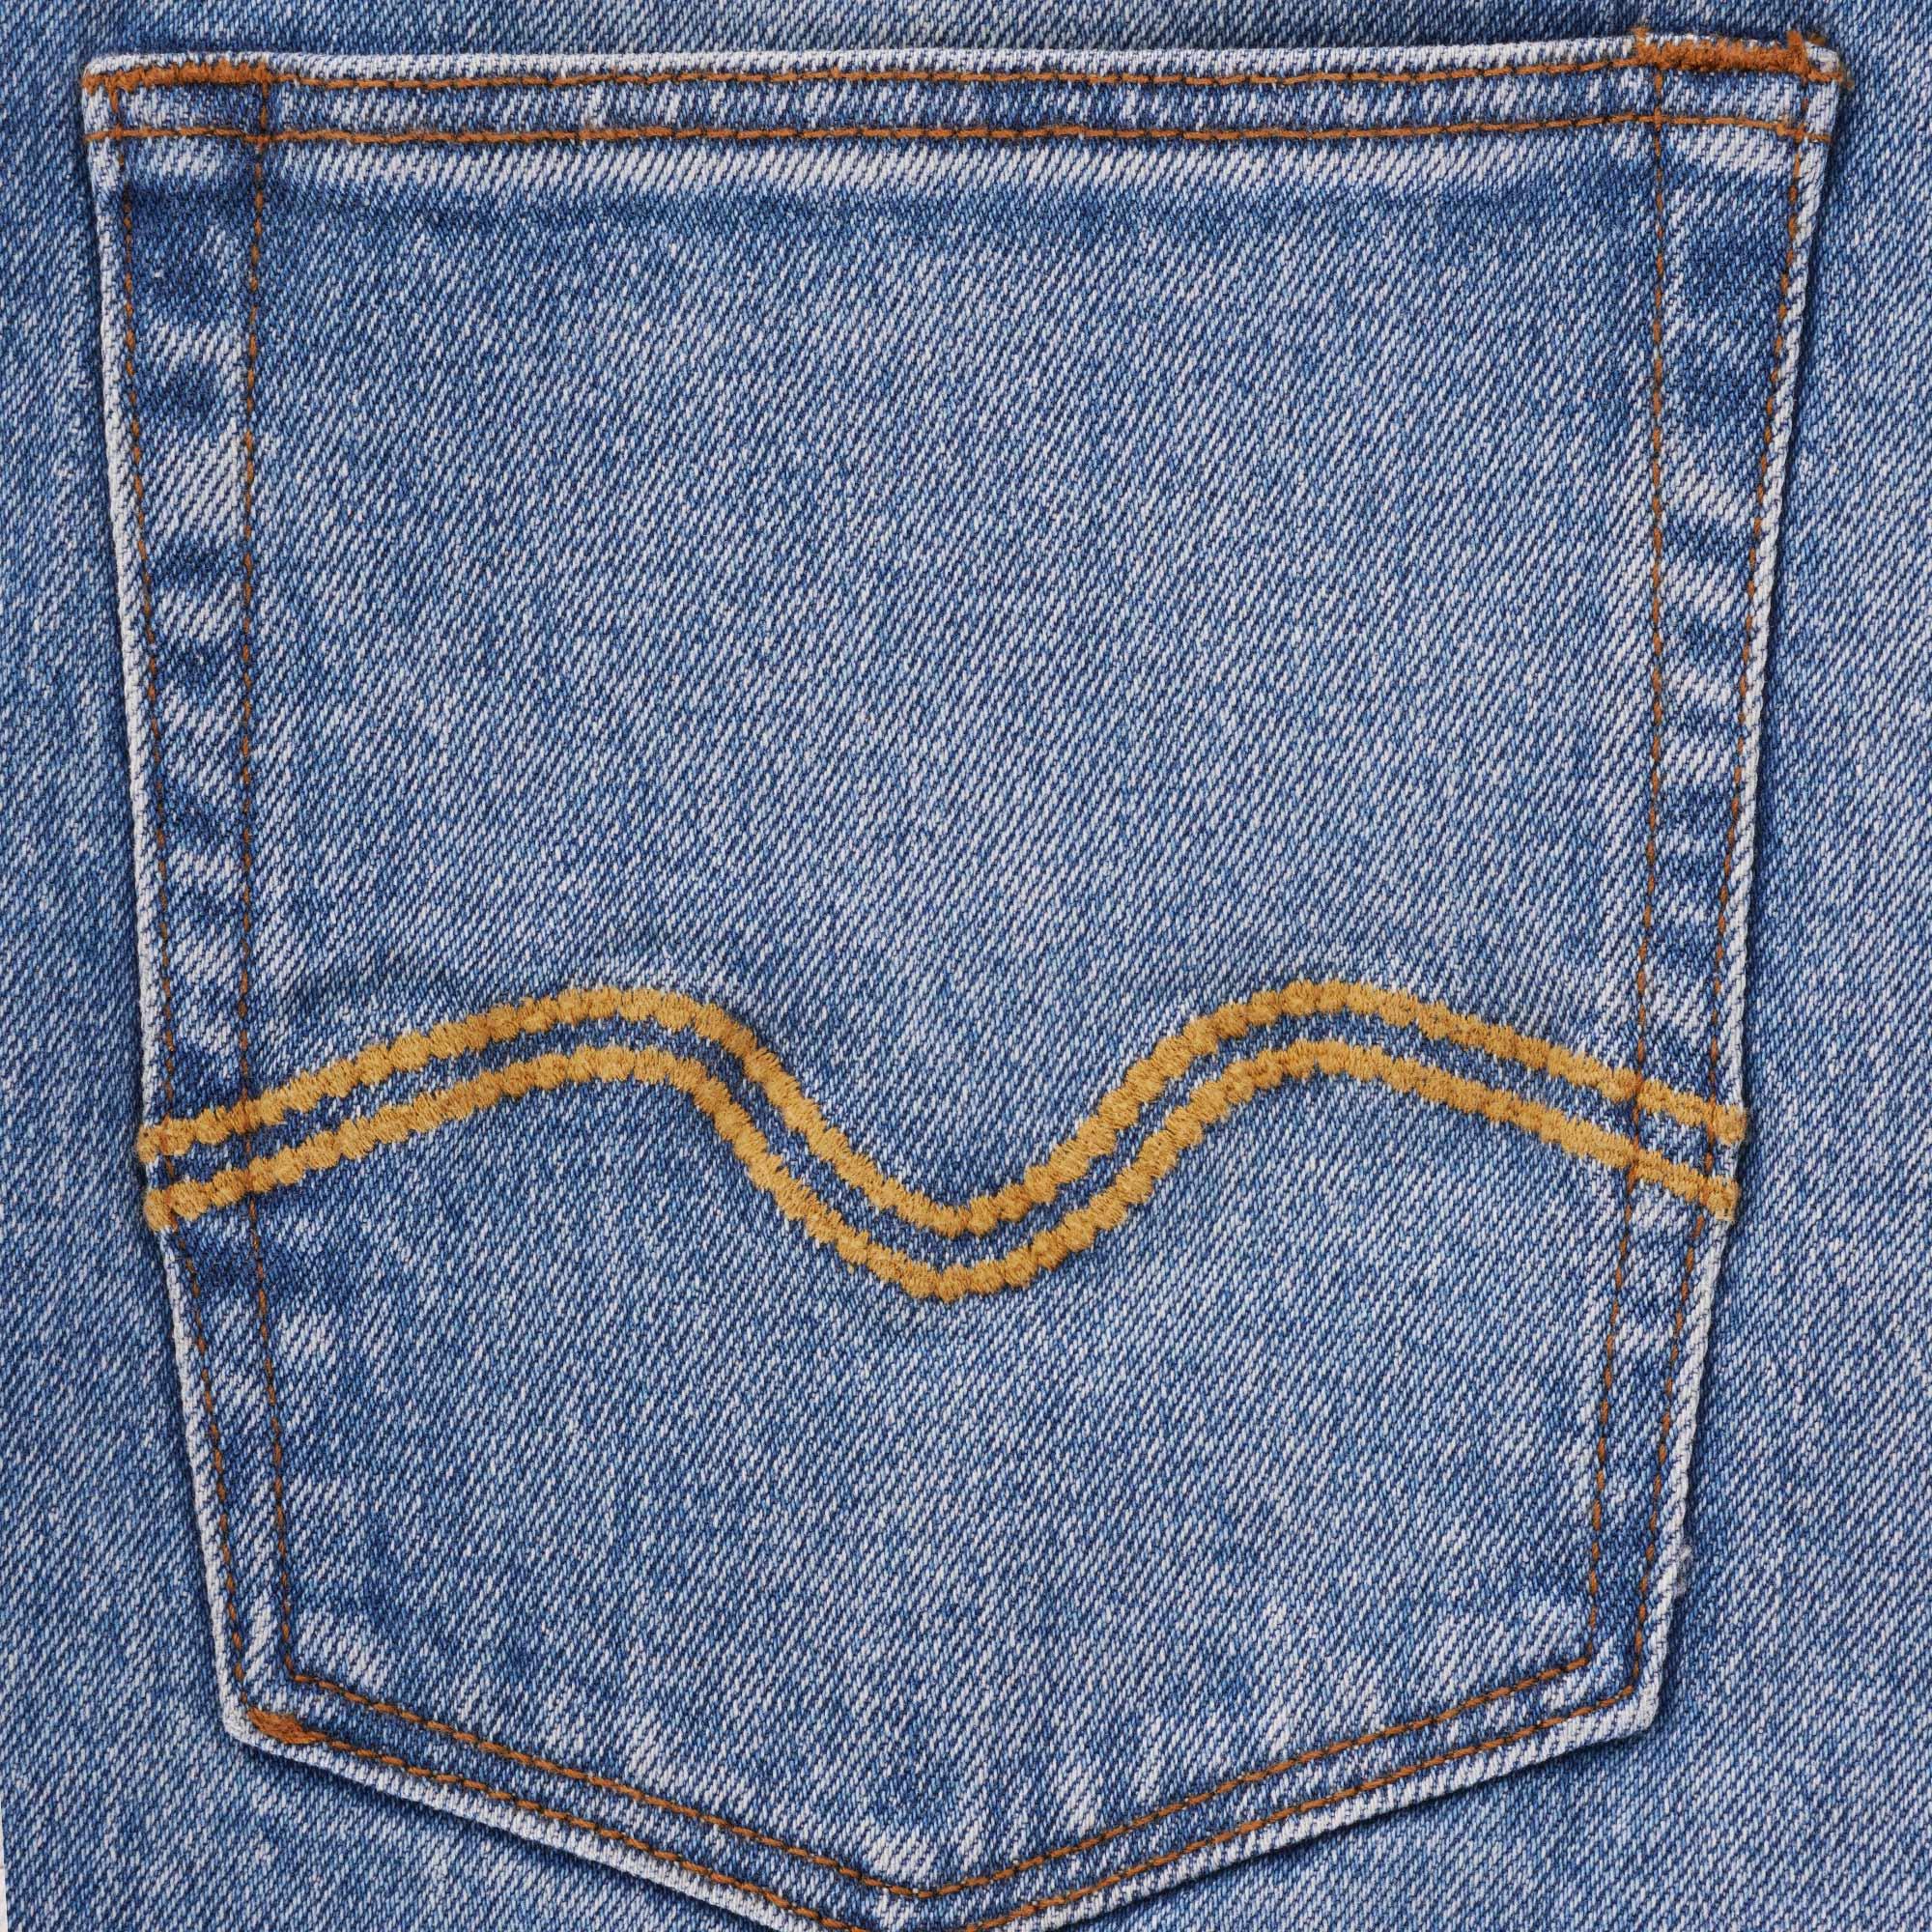 C17 Jeans Stitch Detail